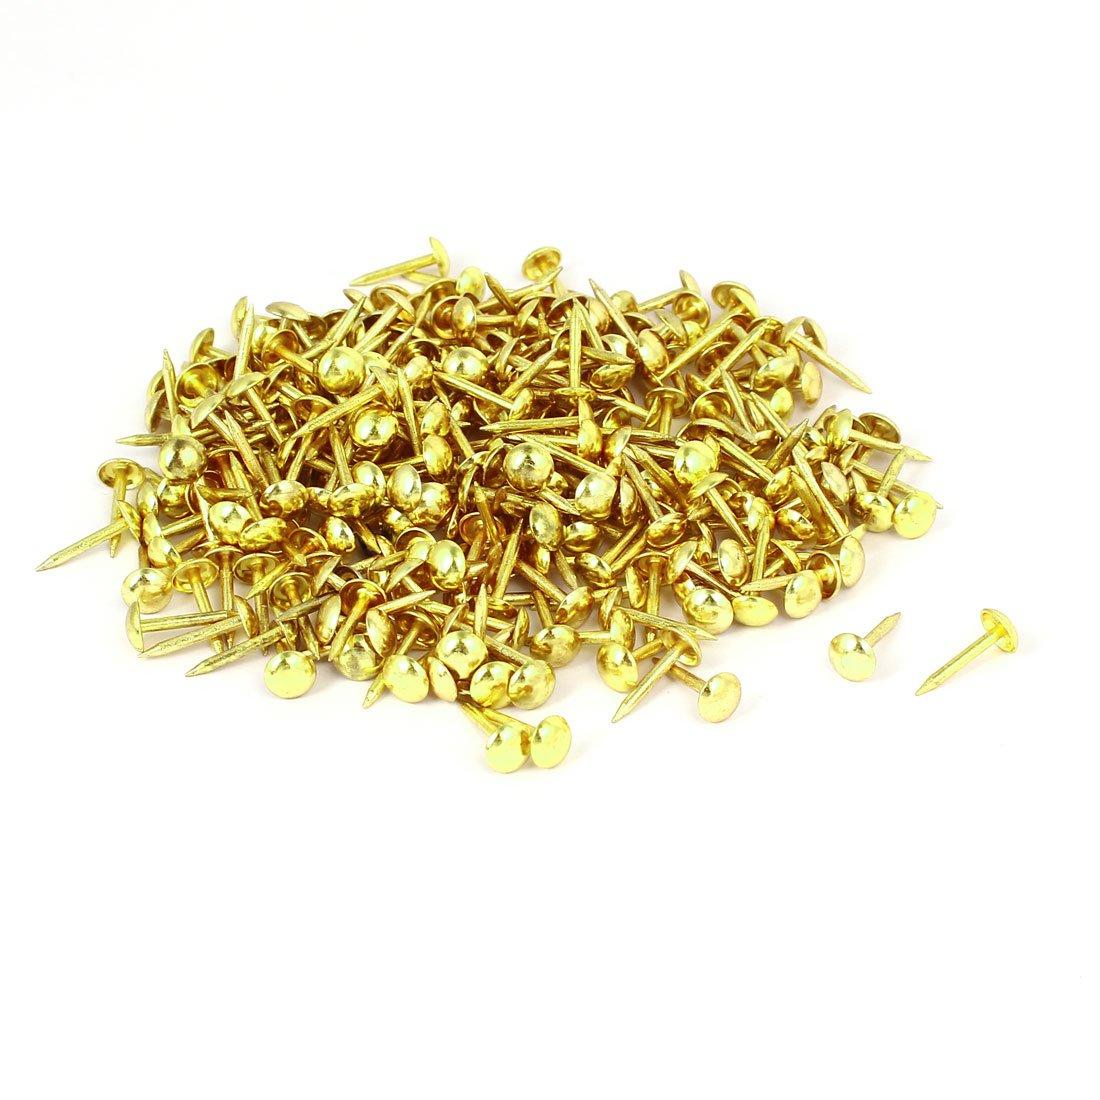 uxcell Home Furniture 6mm x 14mm Upholstery Thumb Tack Nail Push Pin Gold Tone 300pcs